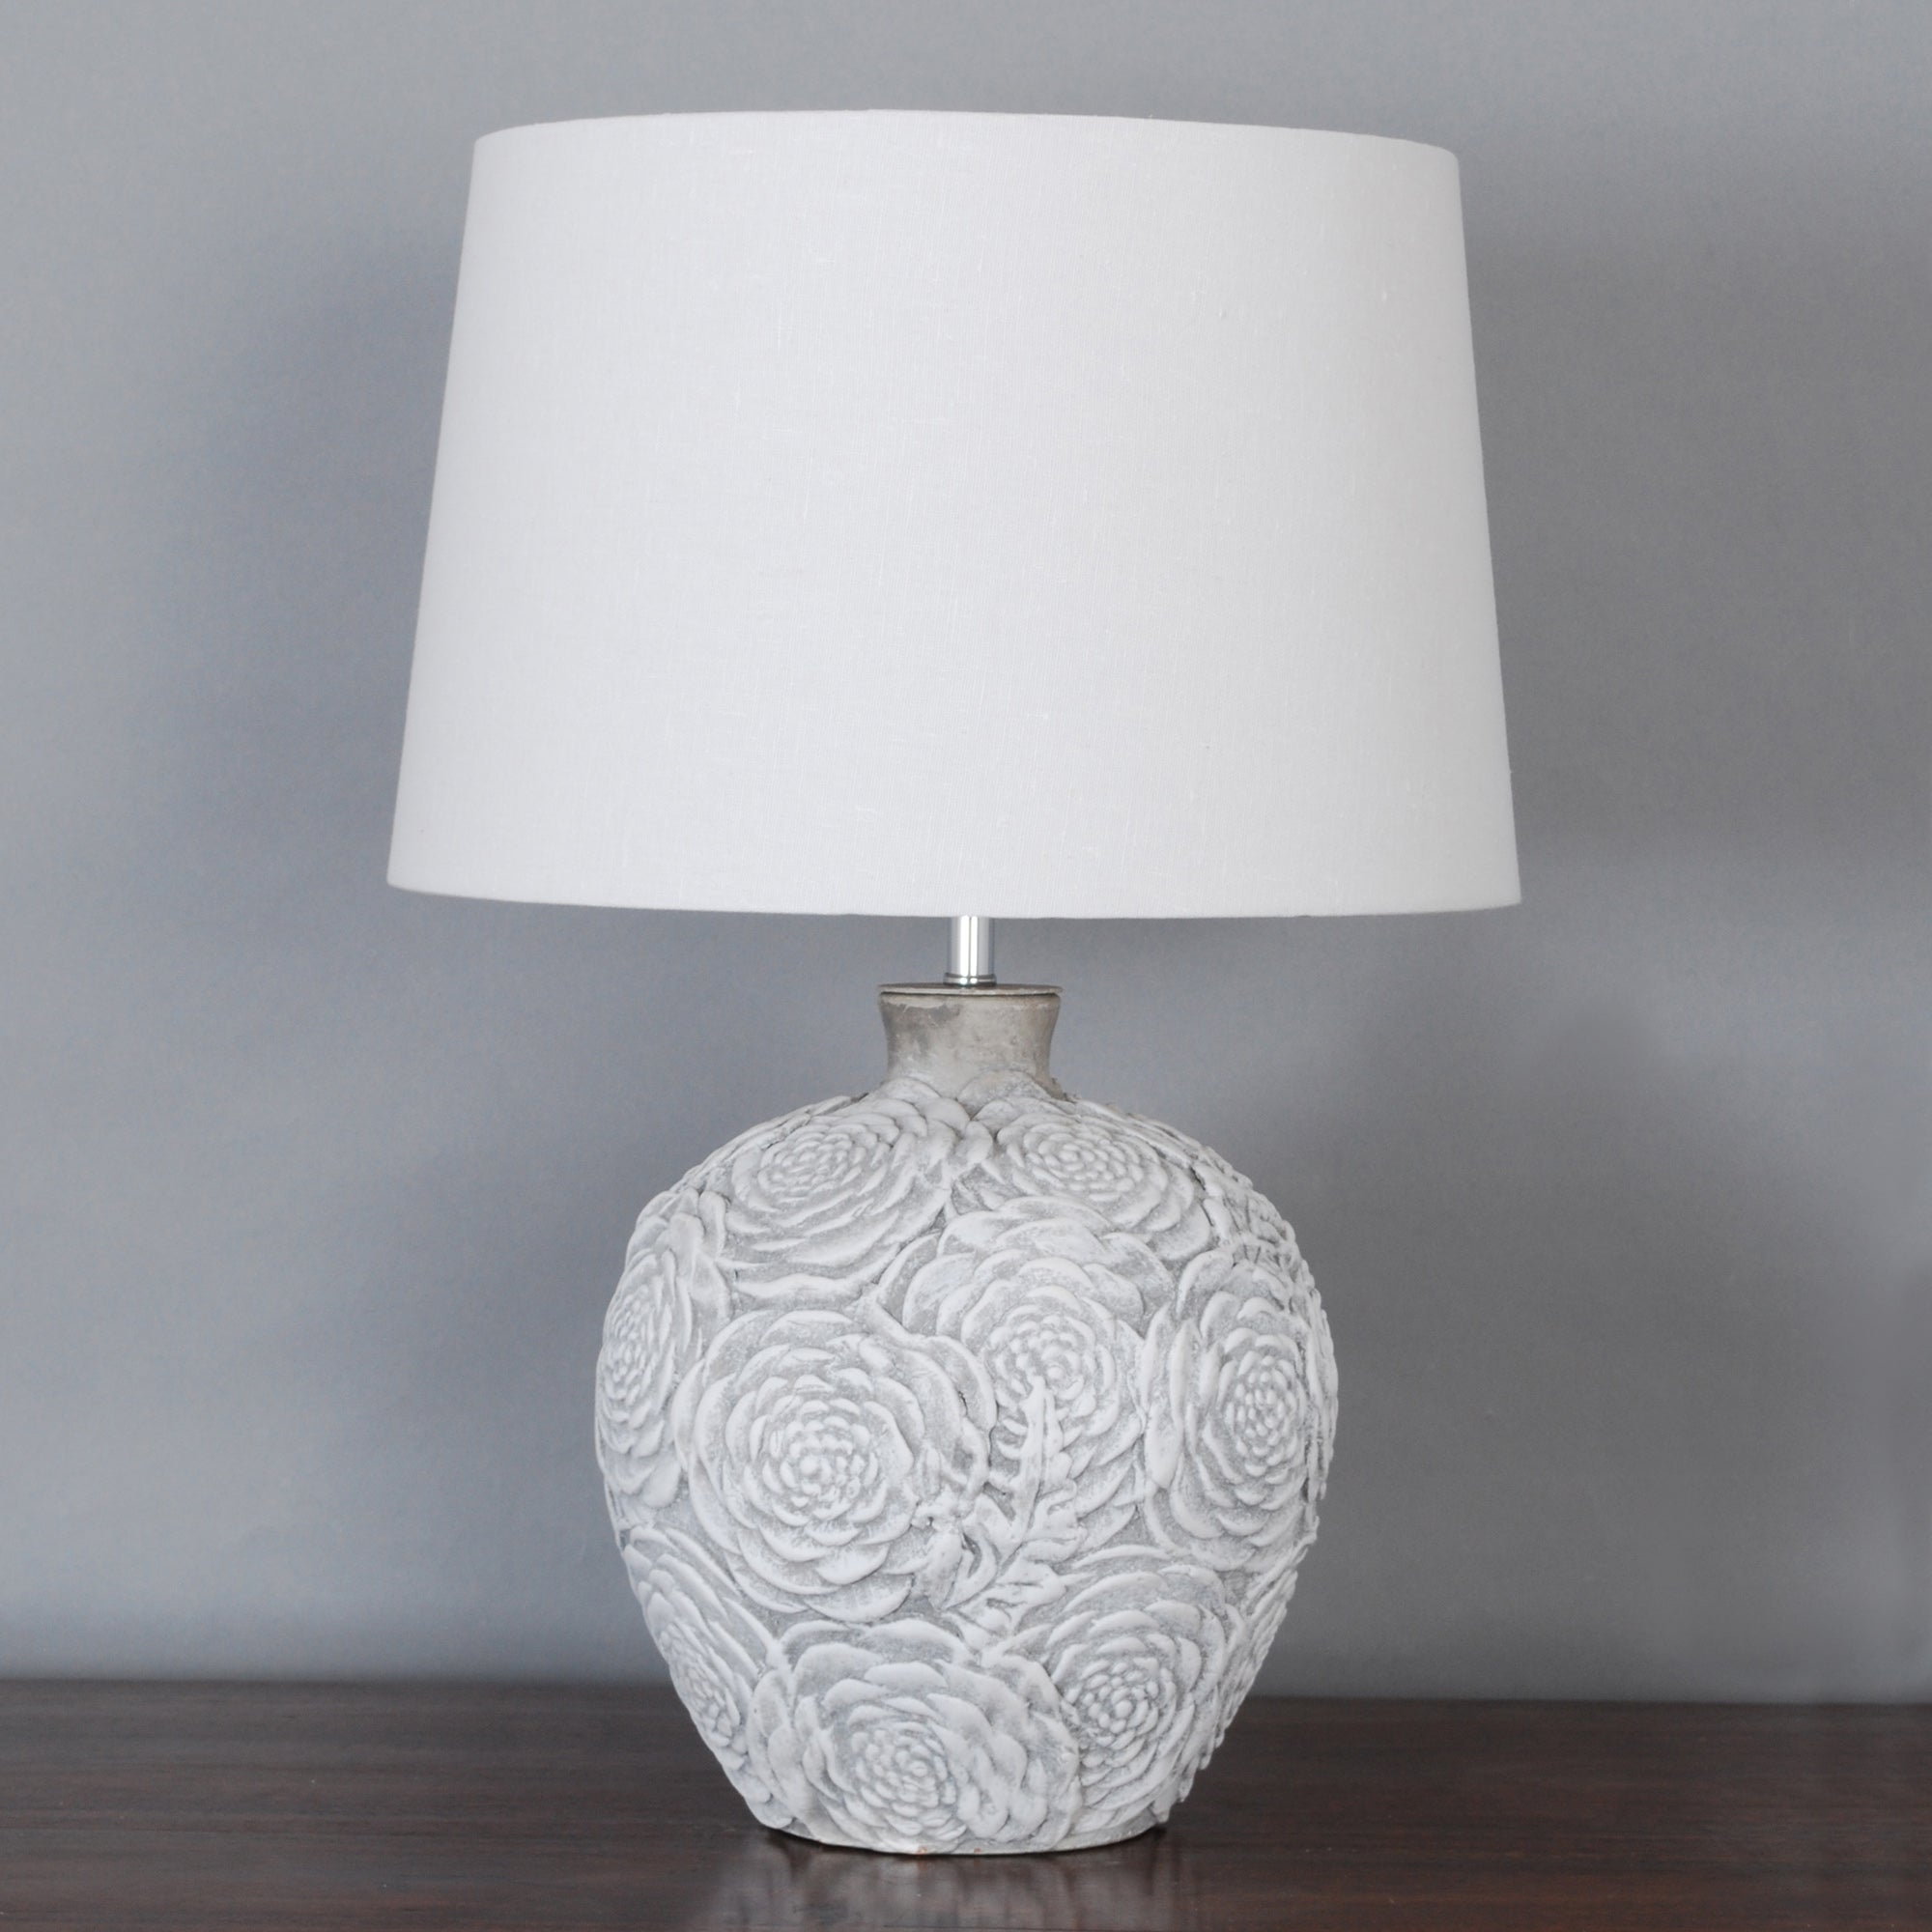 Madrid Stamped Urn Table Lamp